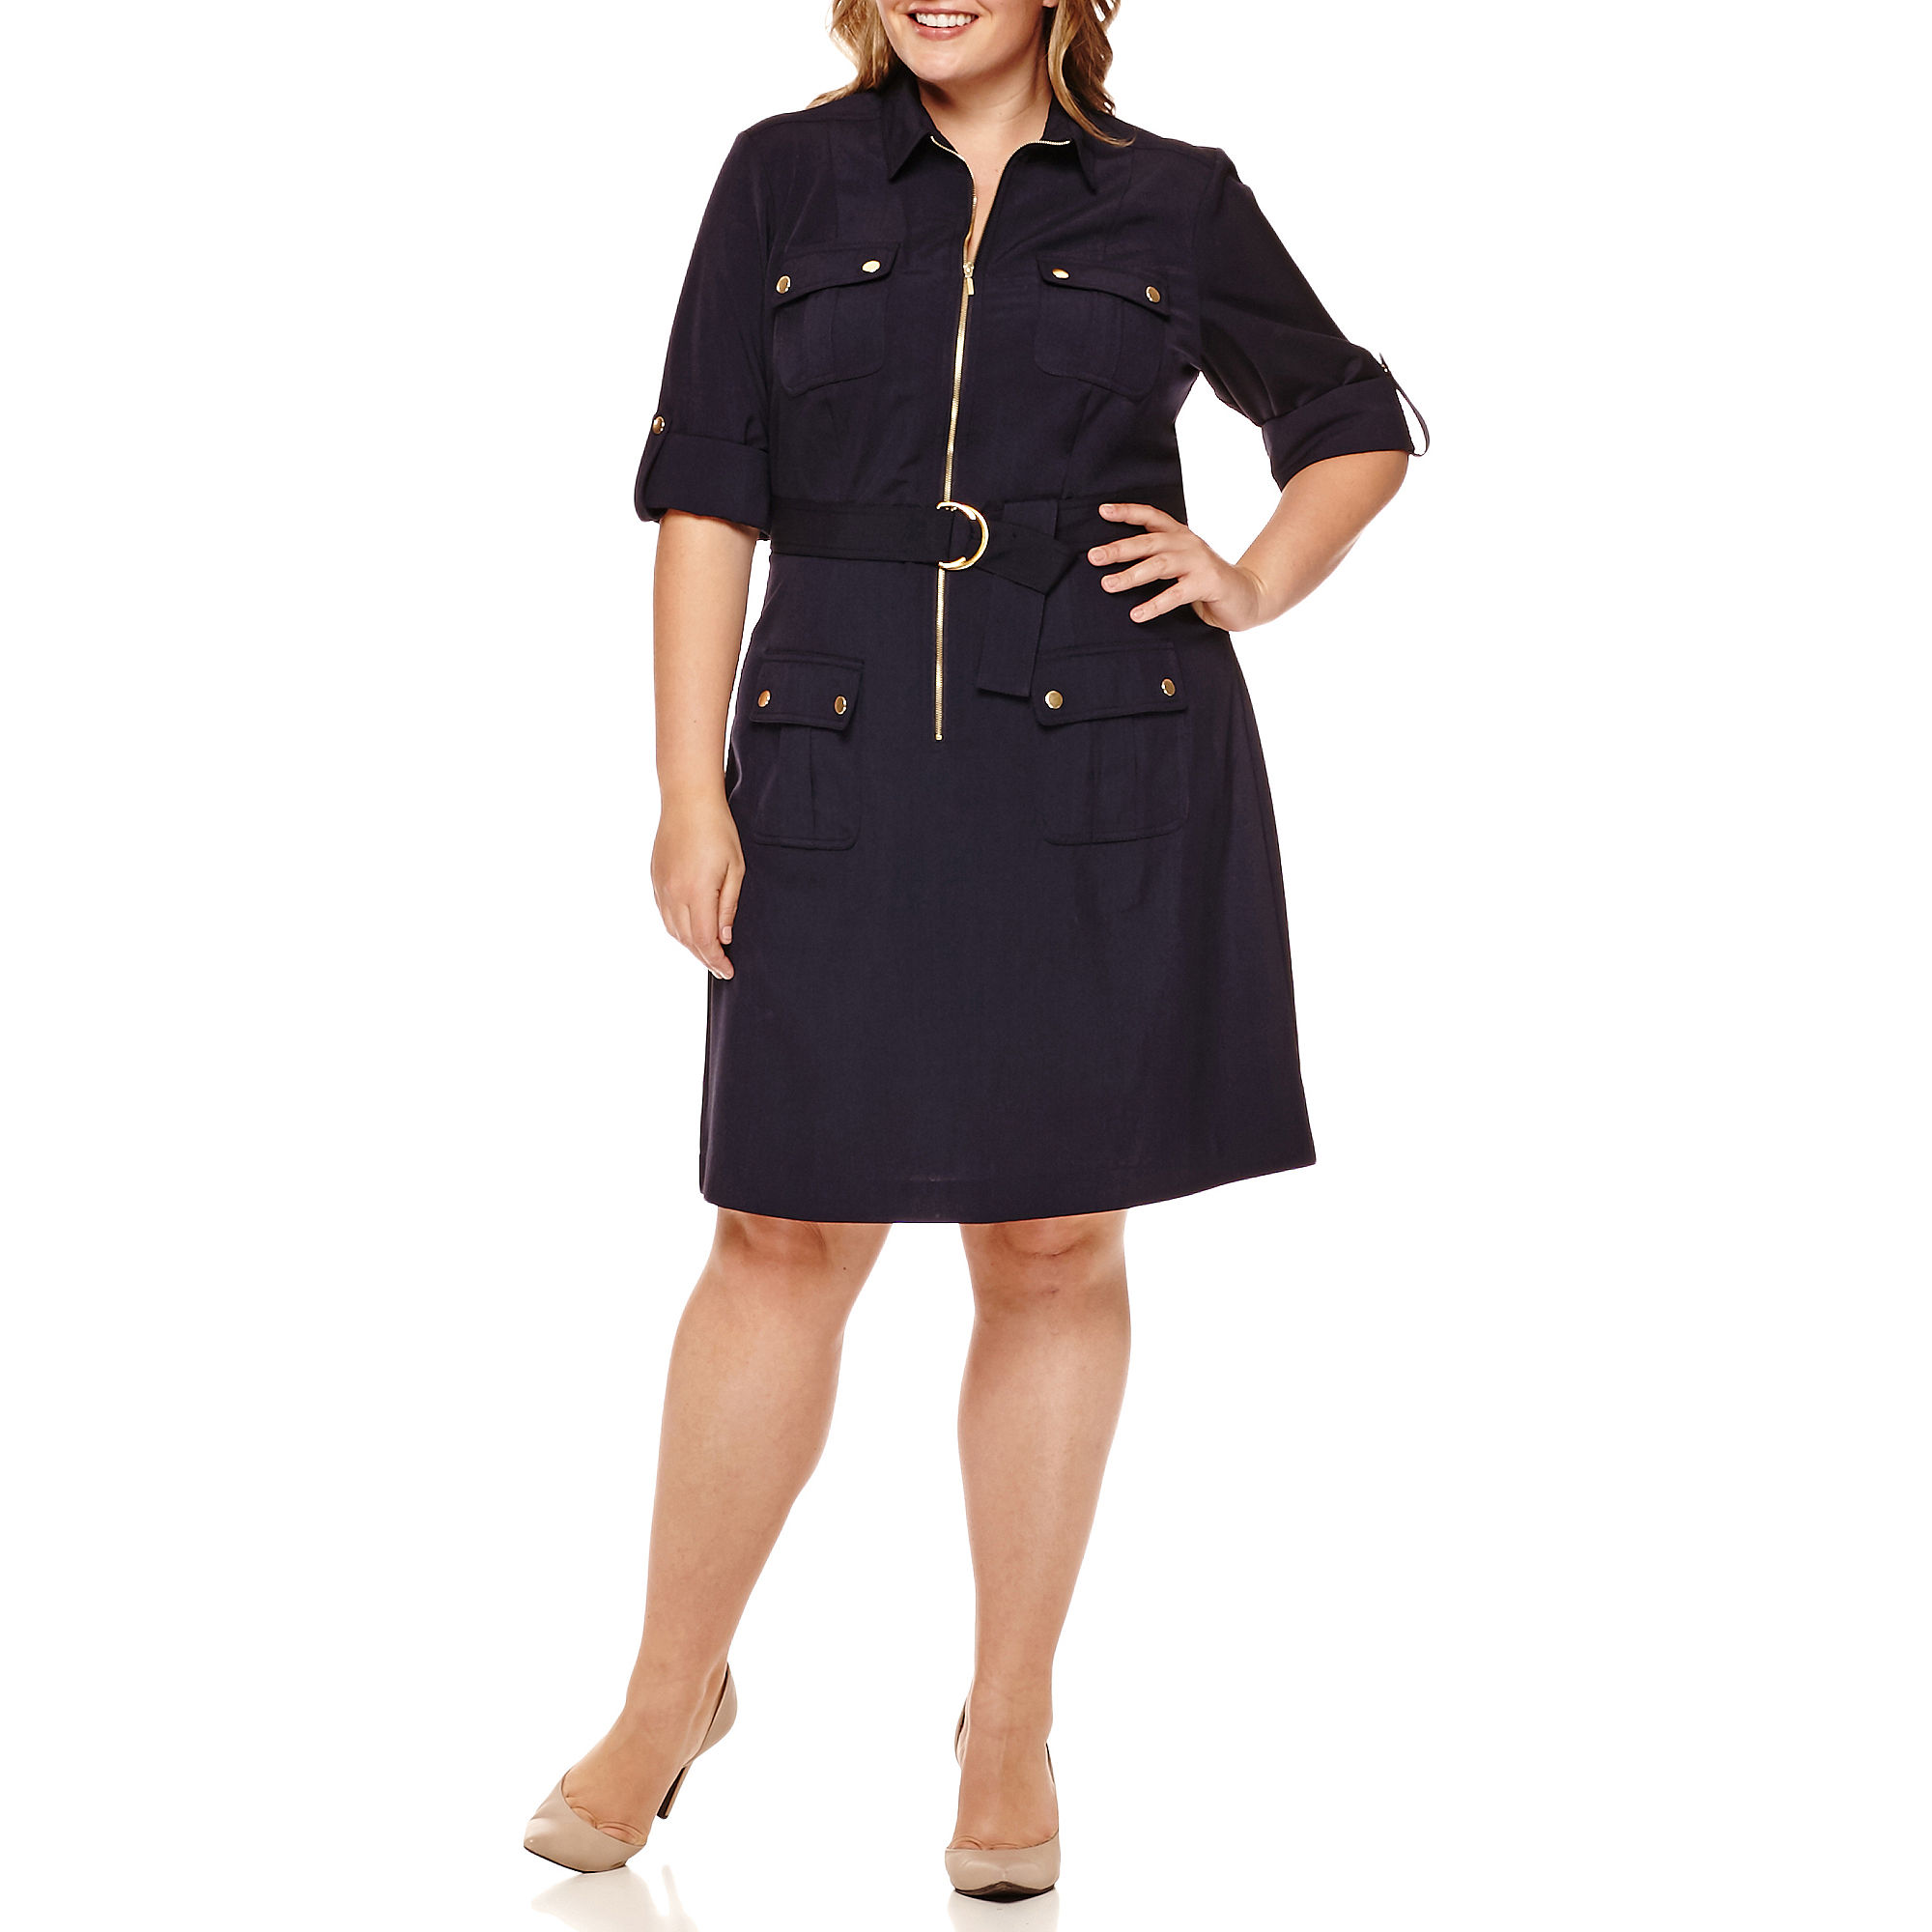 Upc 884148983797 Sharagano 34 Sleeve Zip Front Belted Shirt Dress